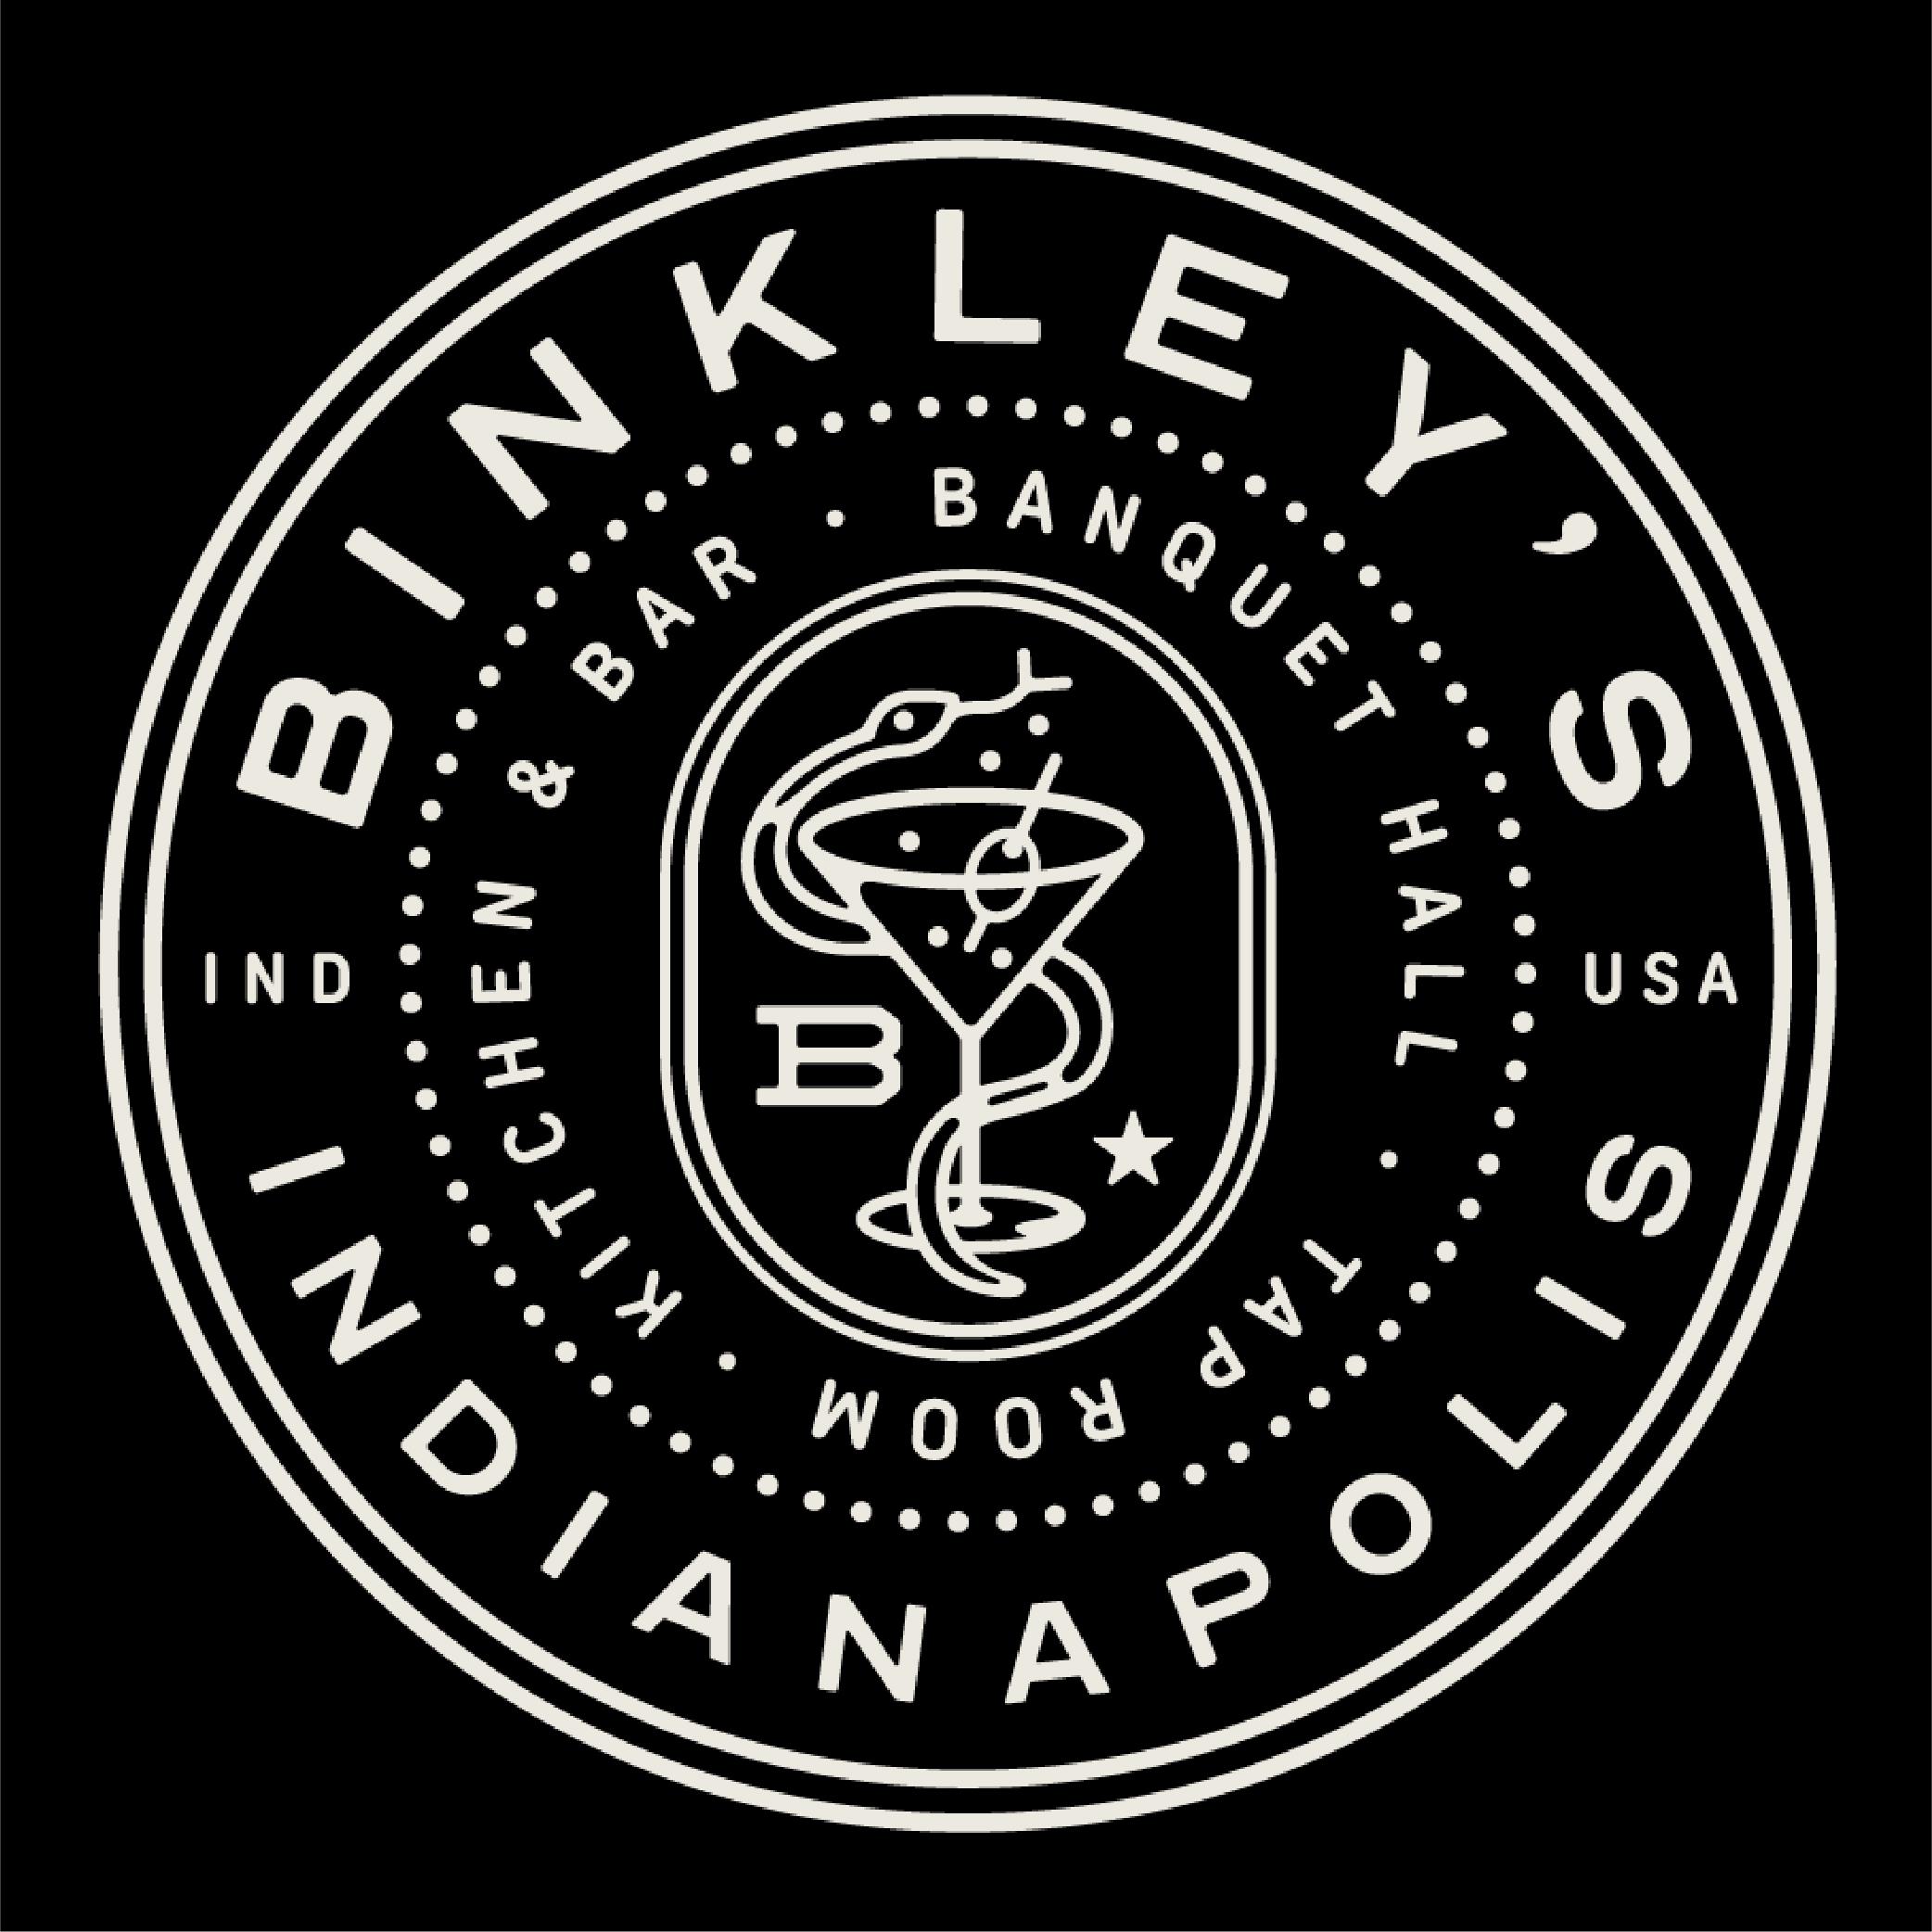 Binkley's Kitchen & Bar